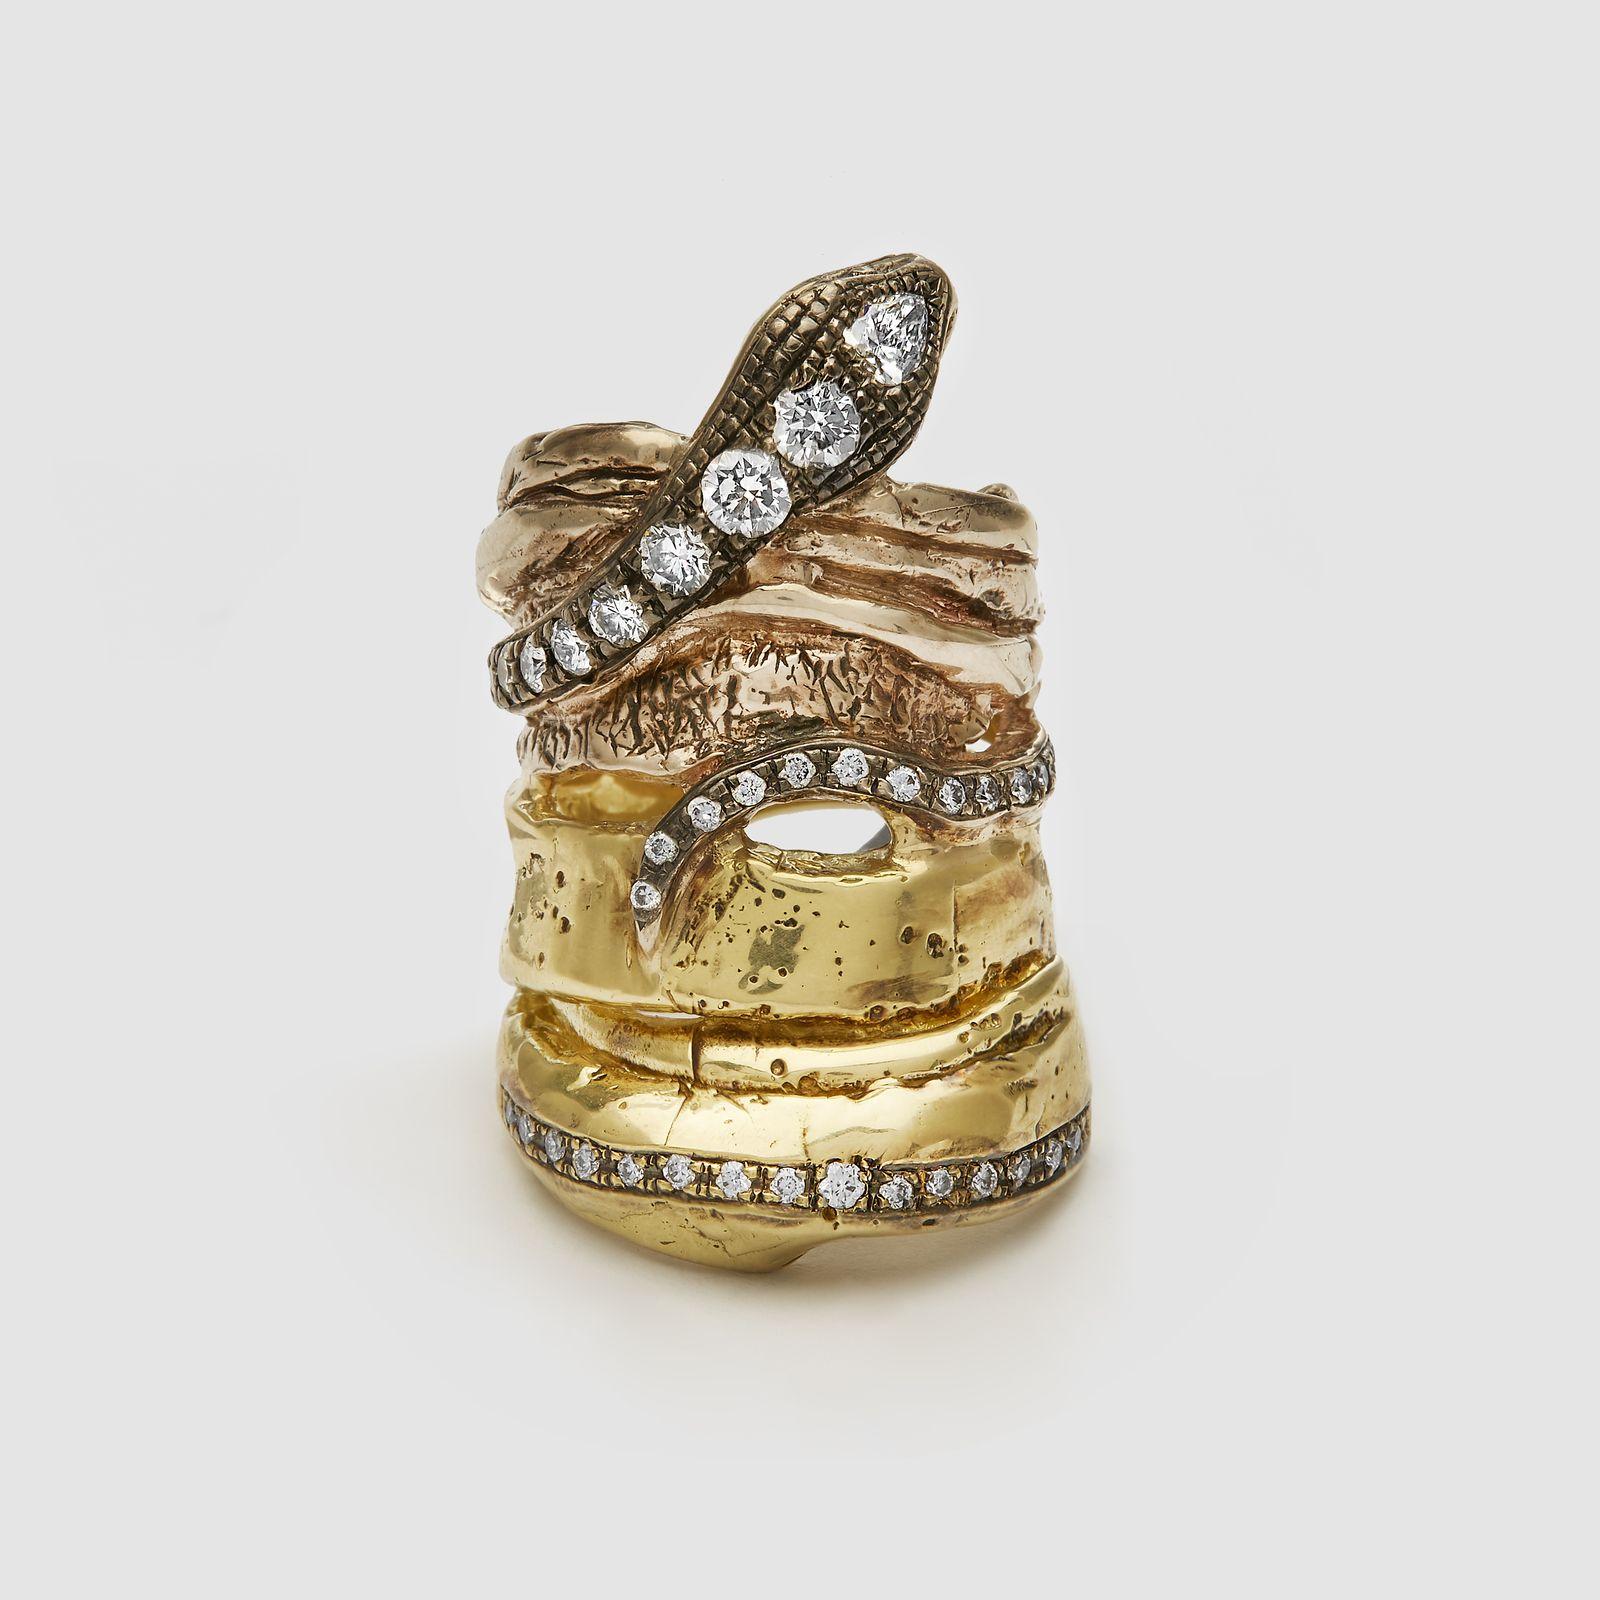 Ring by Hunrod